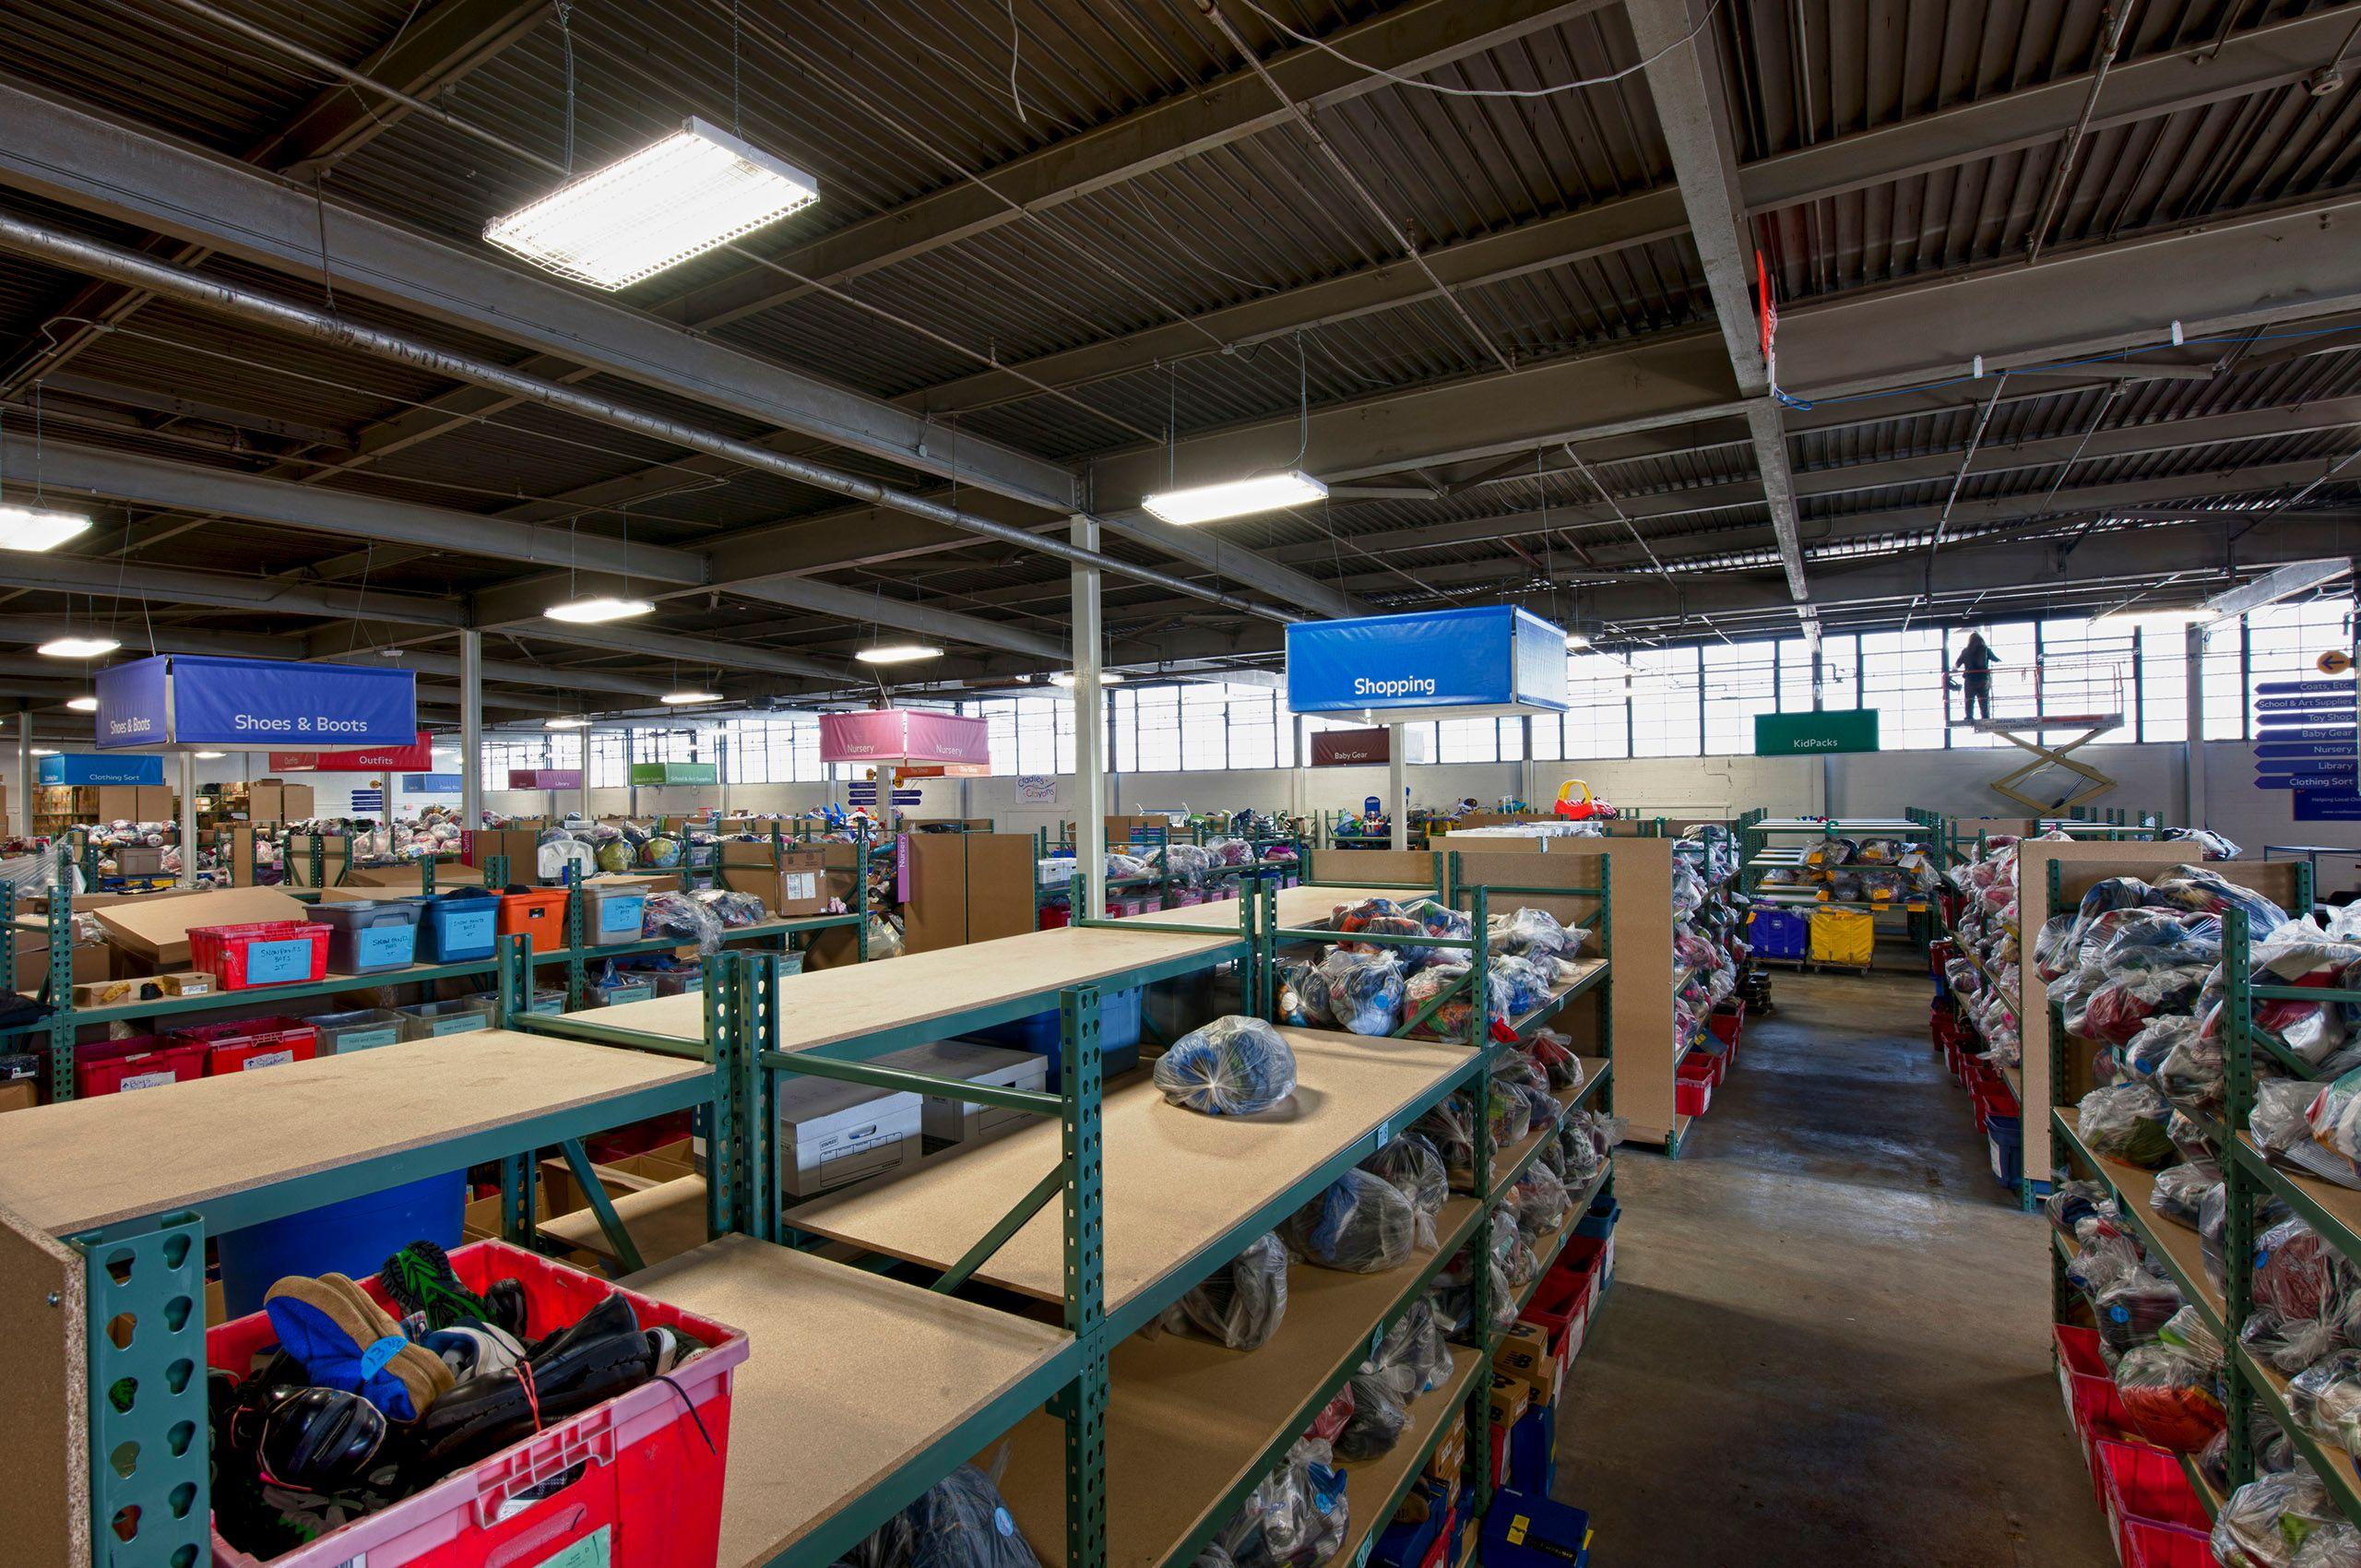 CradlesToCrayons-BrightonMA-Warehouse2.jpg